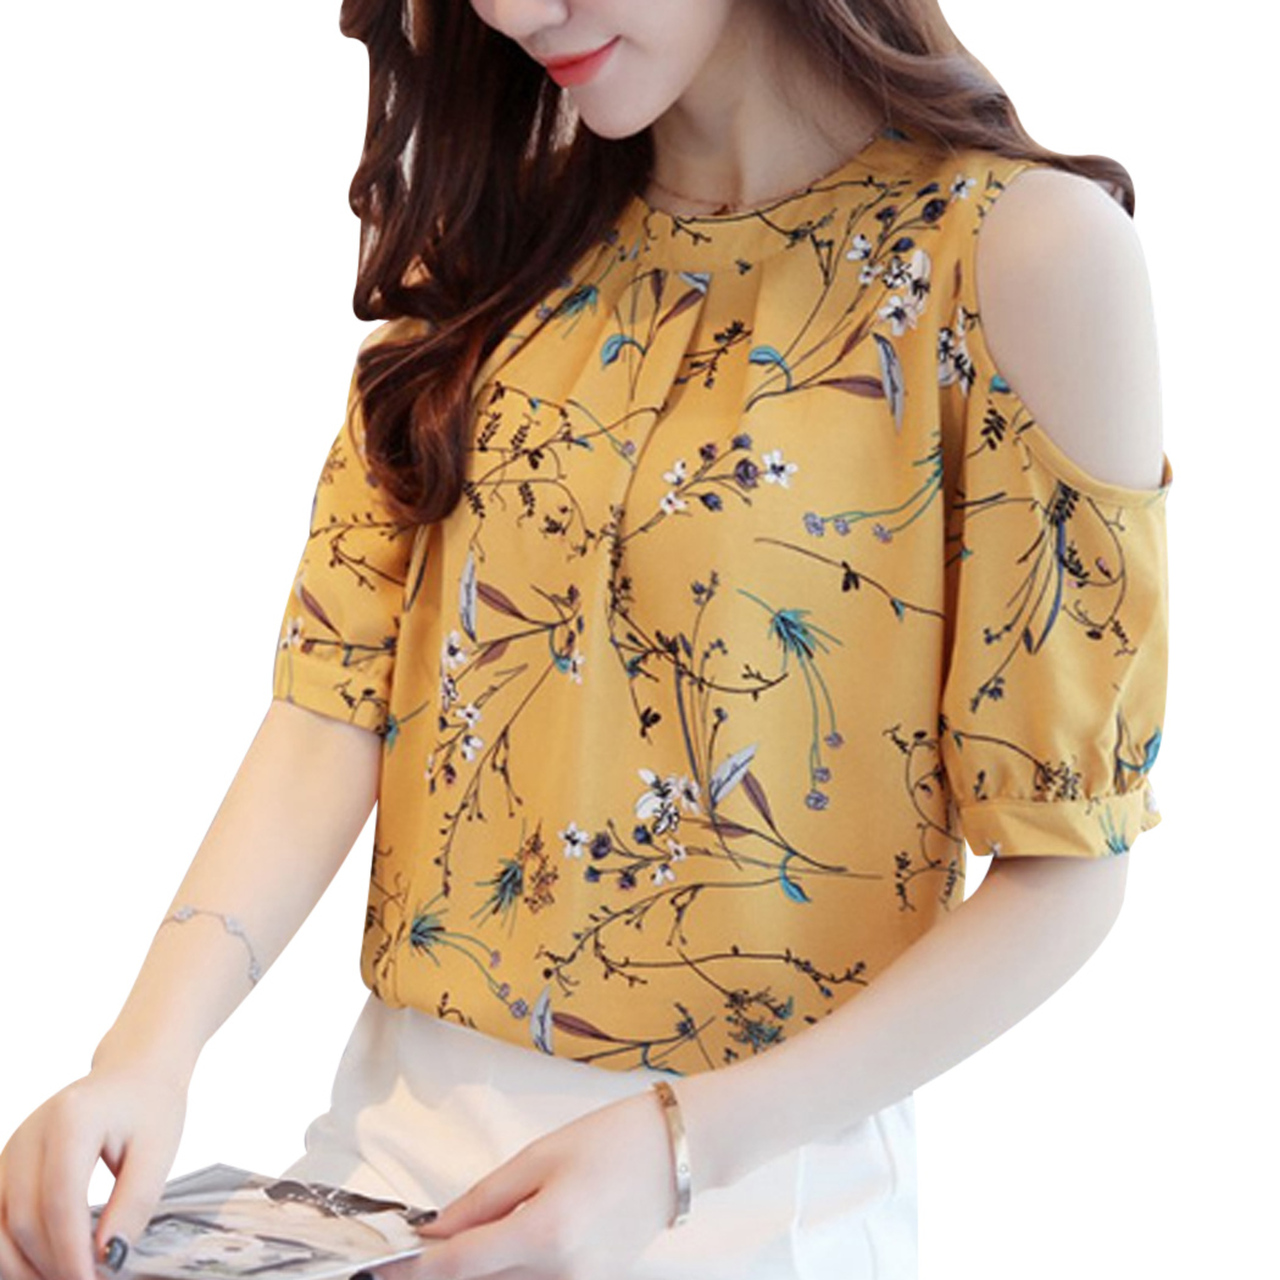 73dd5f6043780f 2018 Summer Cold Shoulder Chiffon Floral Printed Blouse Shirt Women Tops  Elegant Plus Size Ladies Korea ...